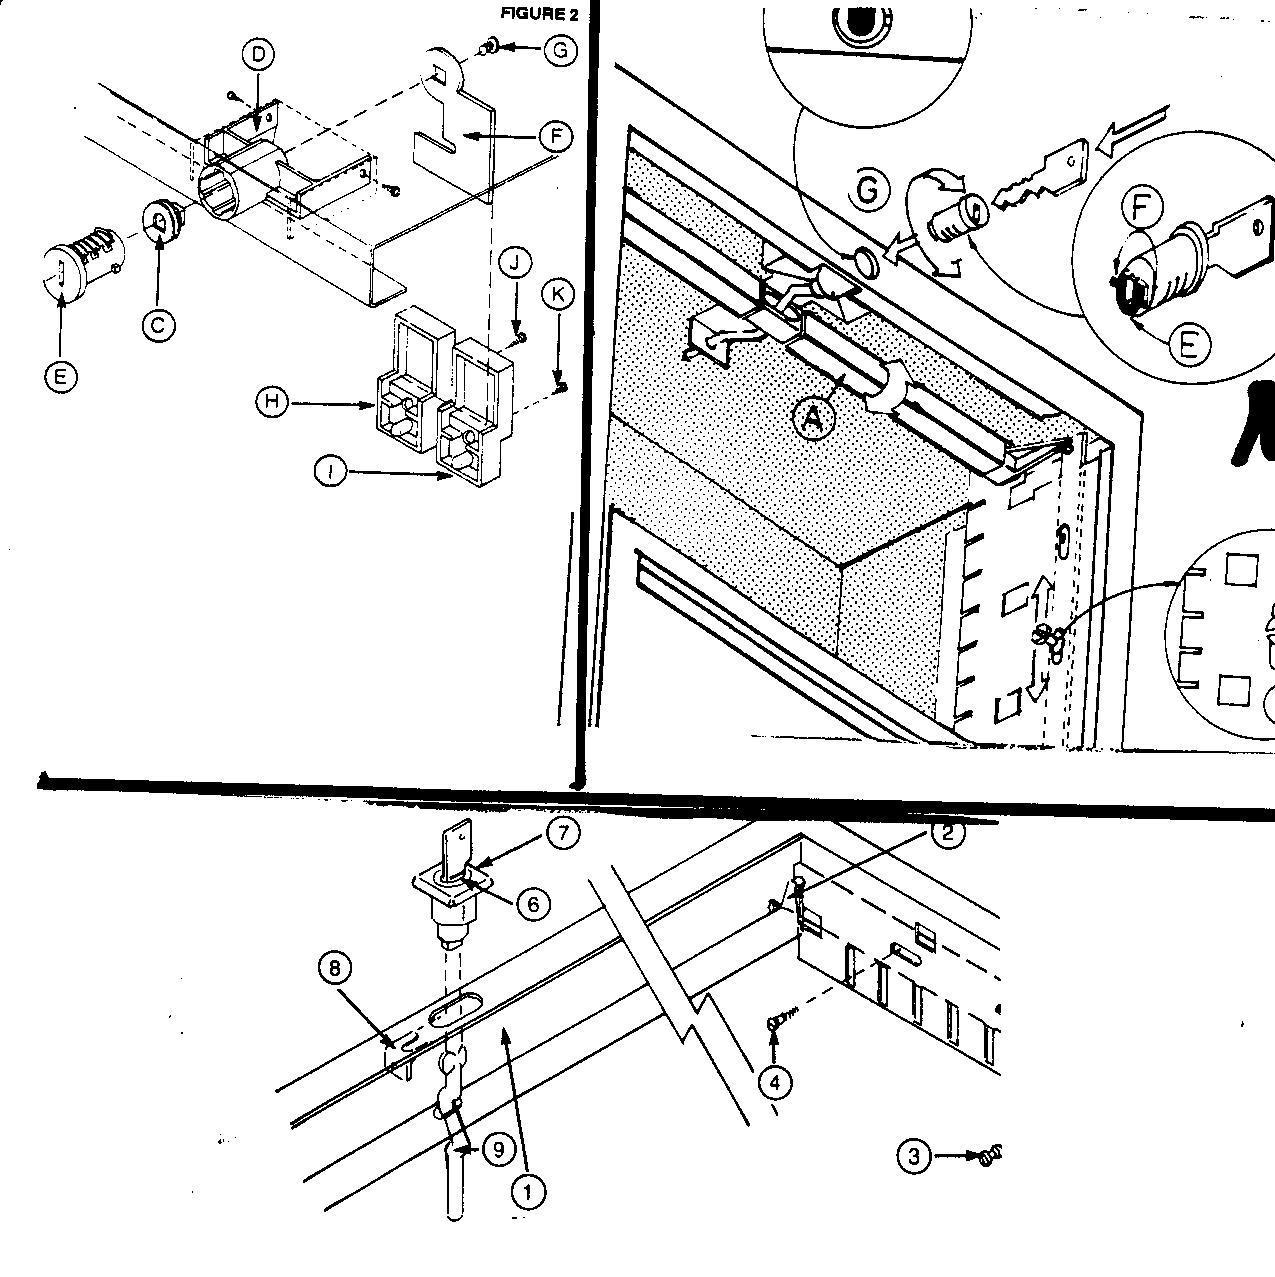 Storwall lockssteel equipment inscape filing cabinets